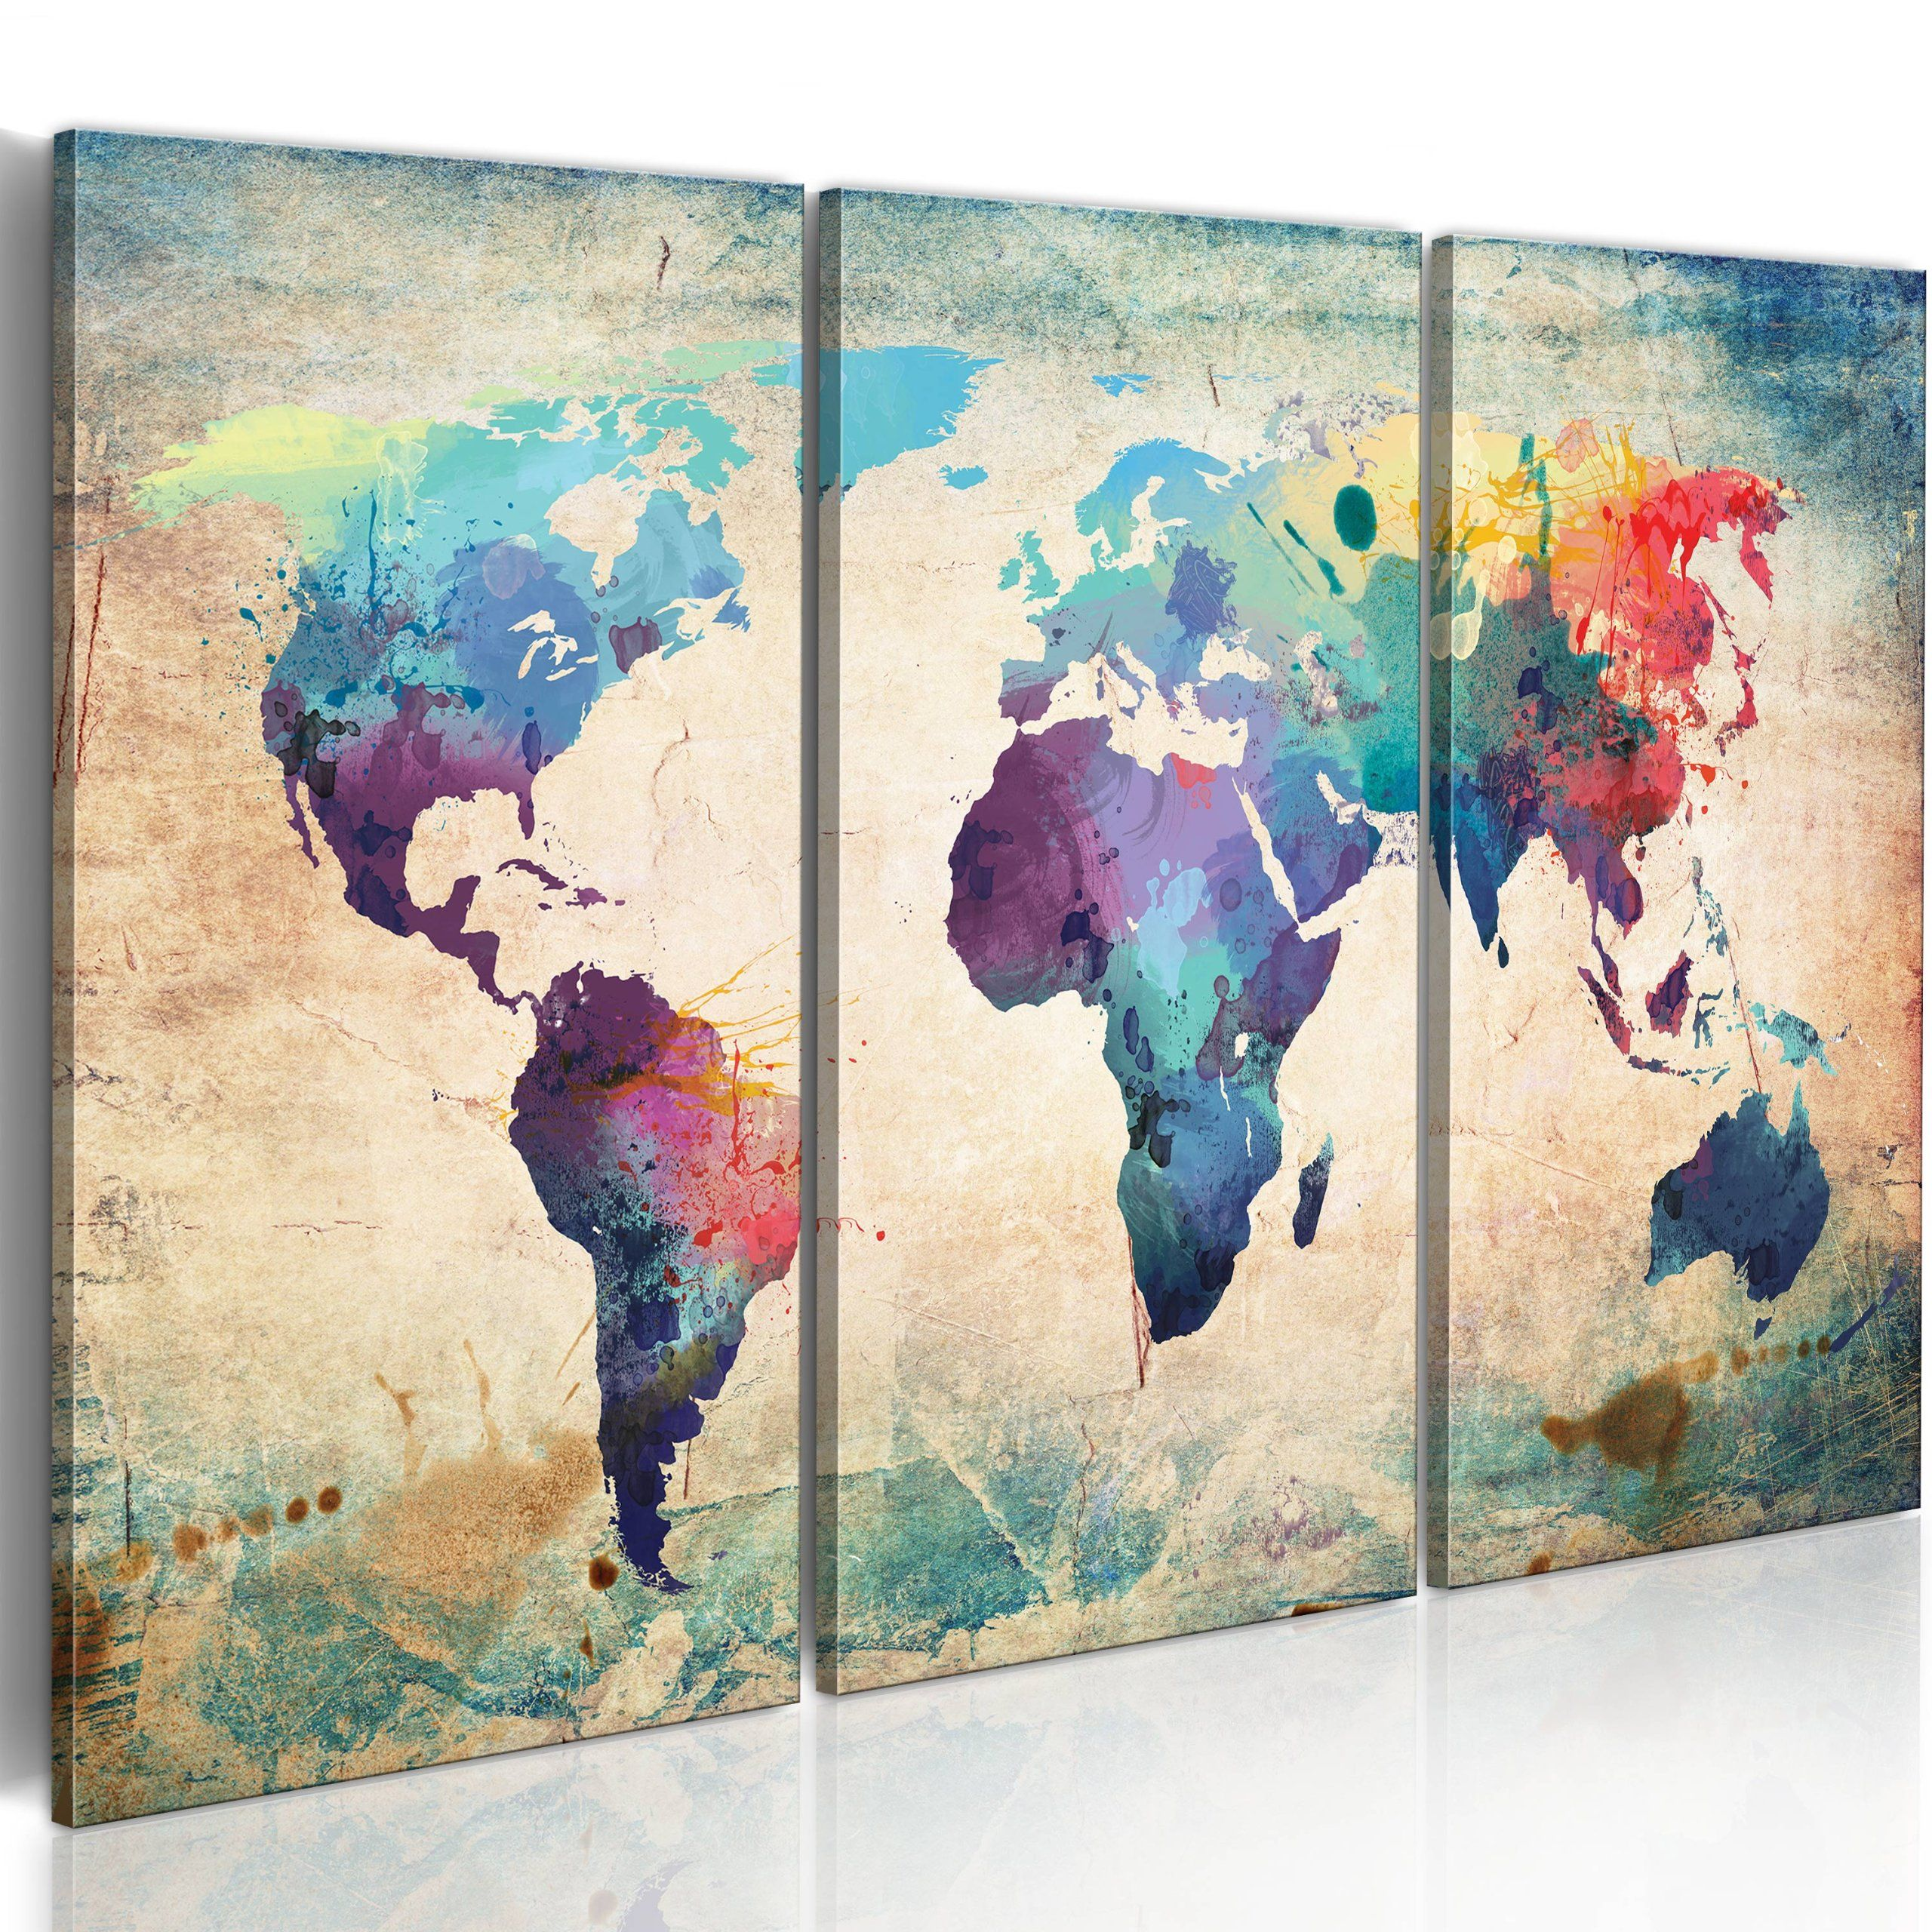 XXL Format Bilder XXL Fertig Aufgespannt Top Vlies Leinwand 3 Teilig  Weltkarte Wand Bilder Cm Bu0026D XXL Riesen Bilder Kunstdruck Wandbild